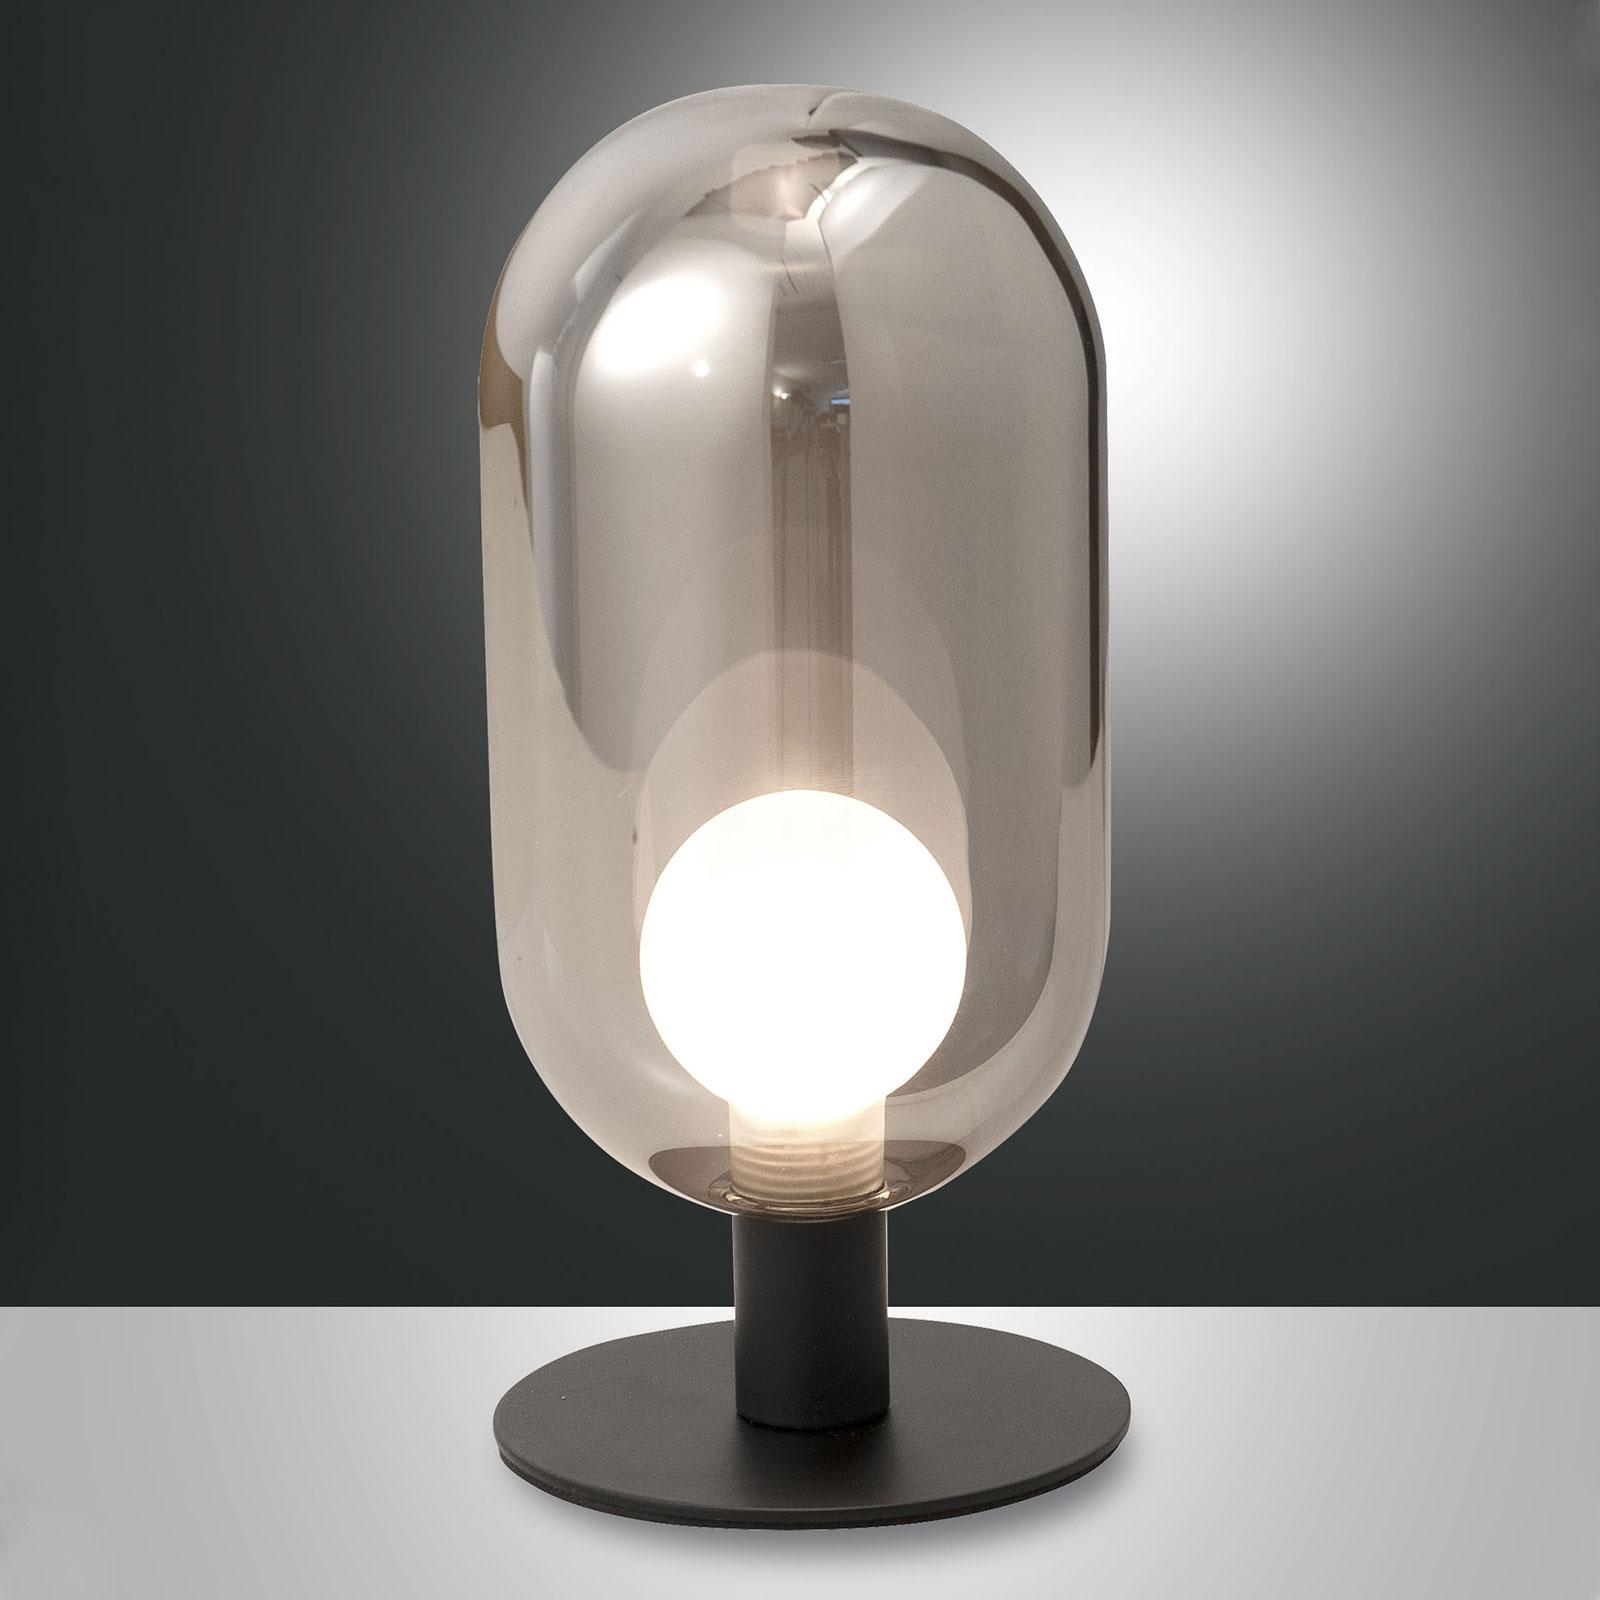 LED tafellamp Gubbio, ovale glazen kap, rook